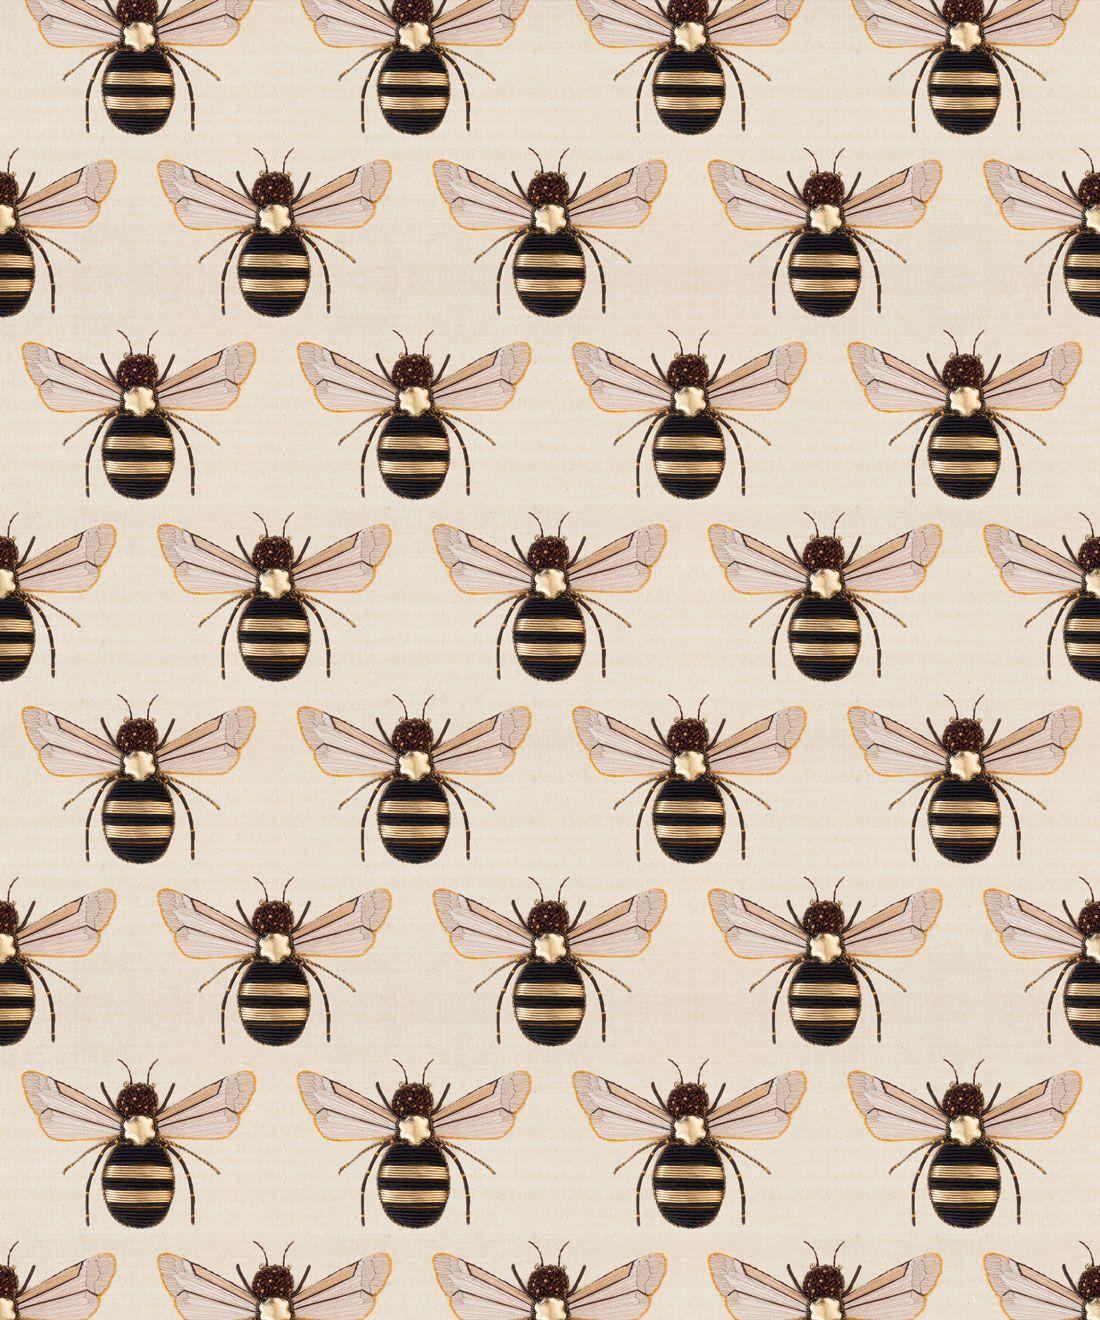 Golden Bee Embroidery Wallpaper